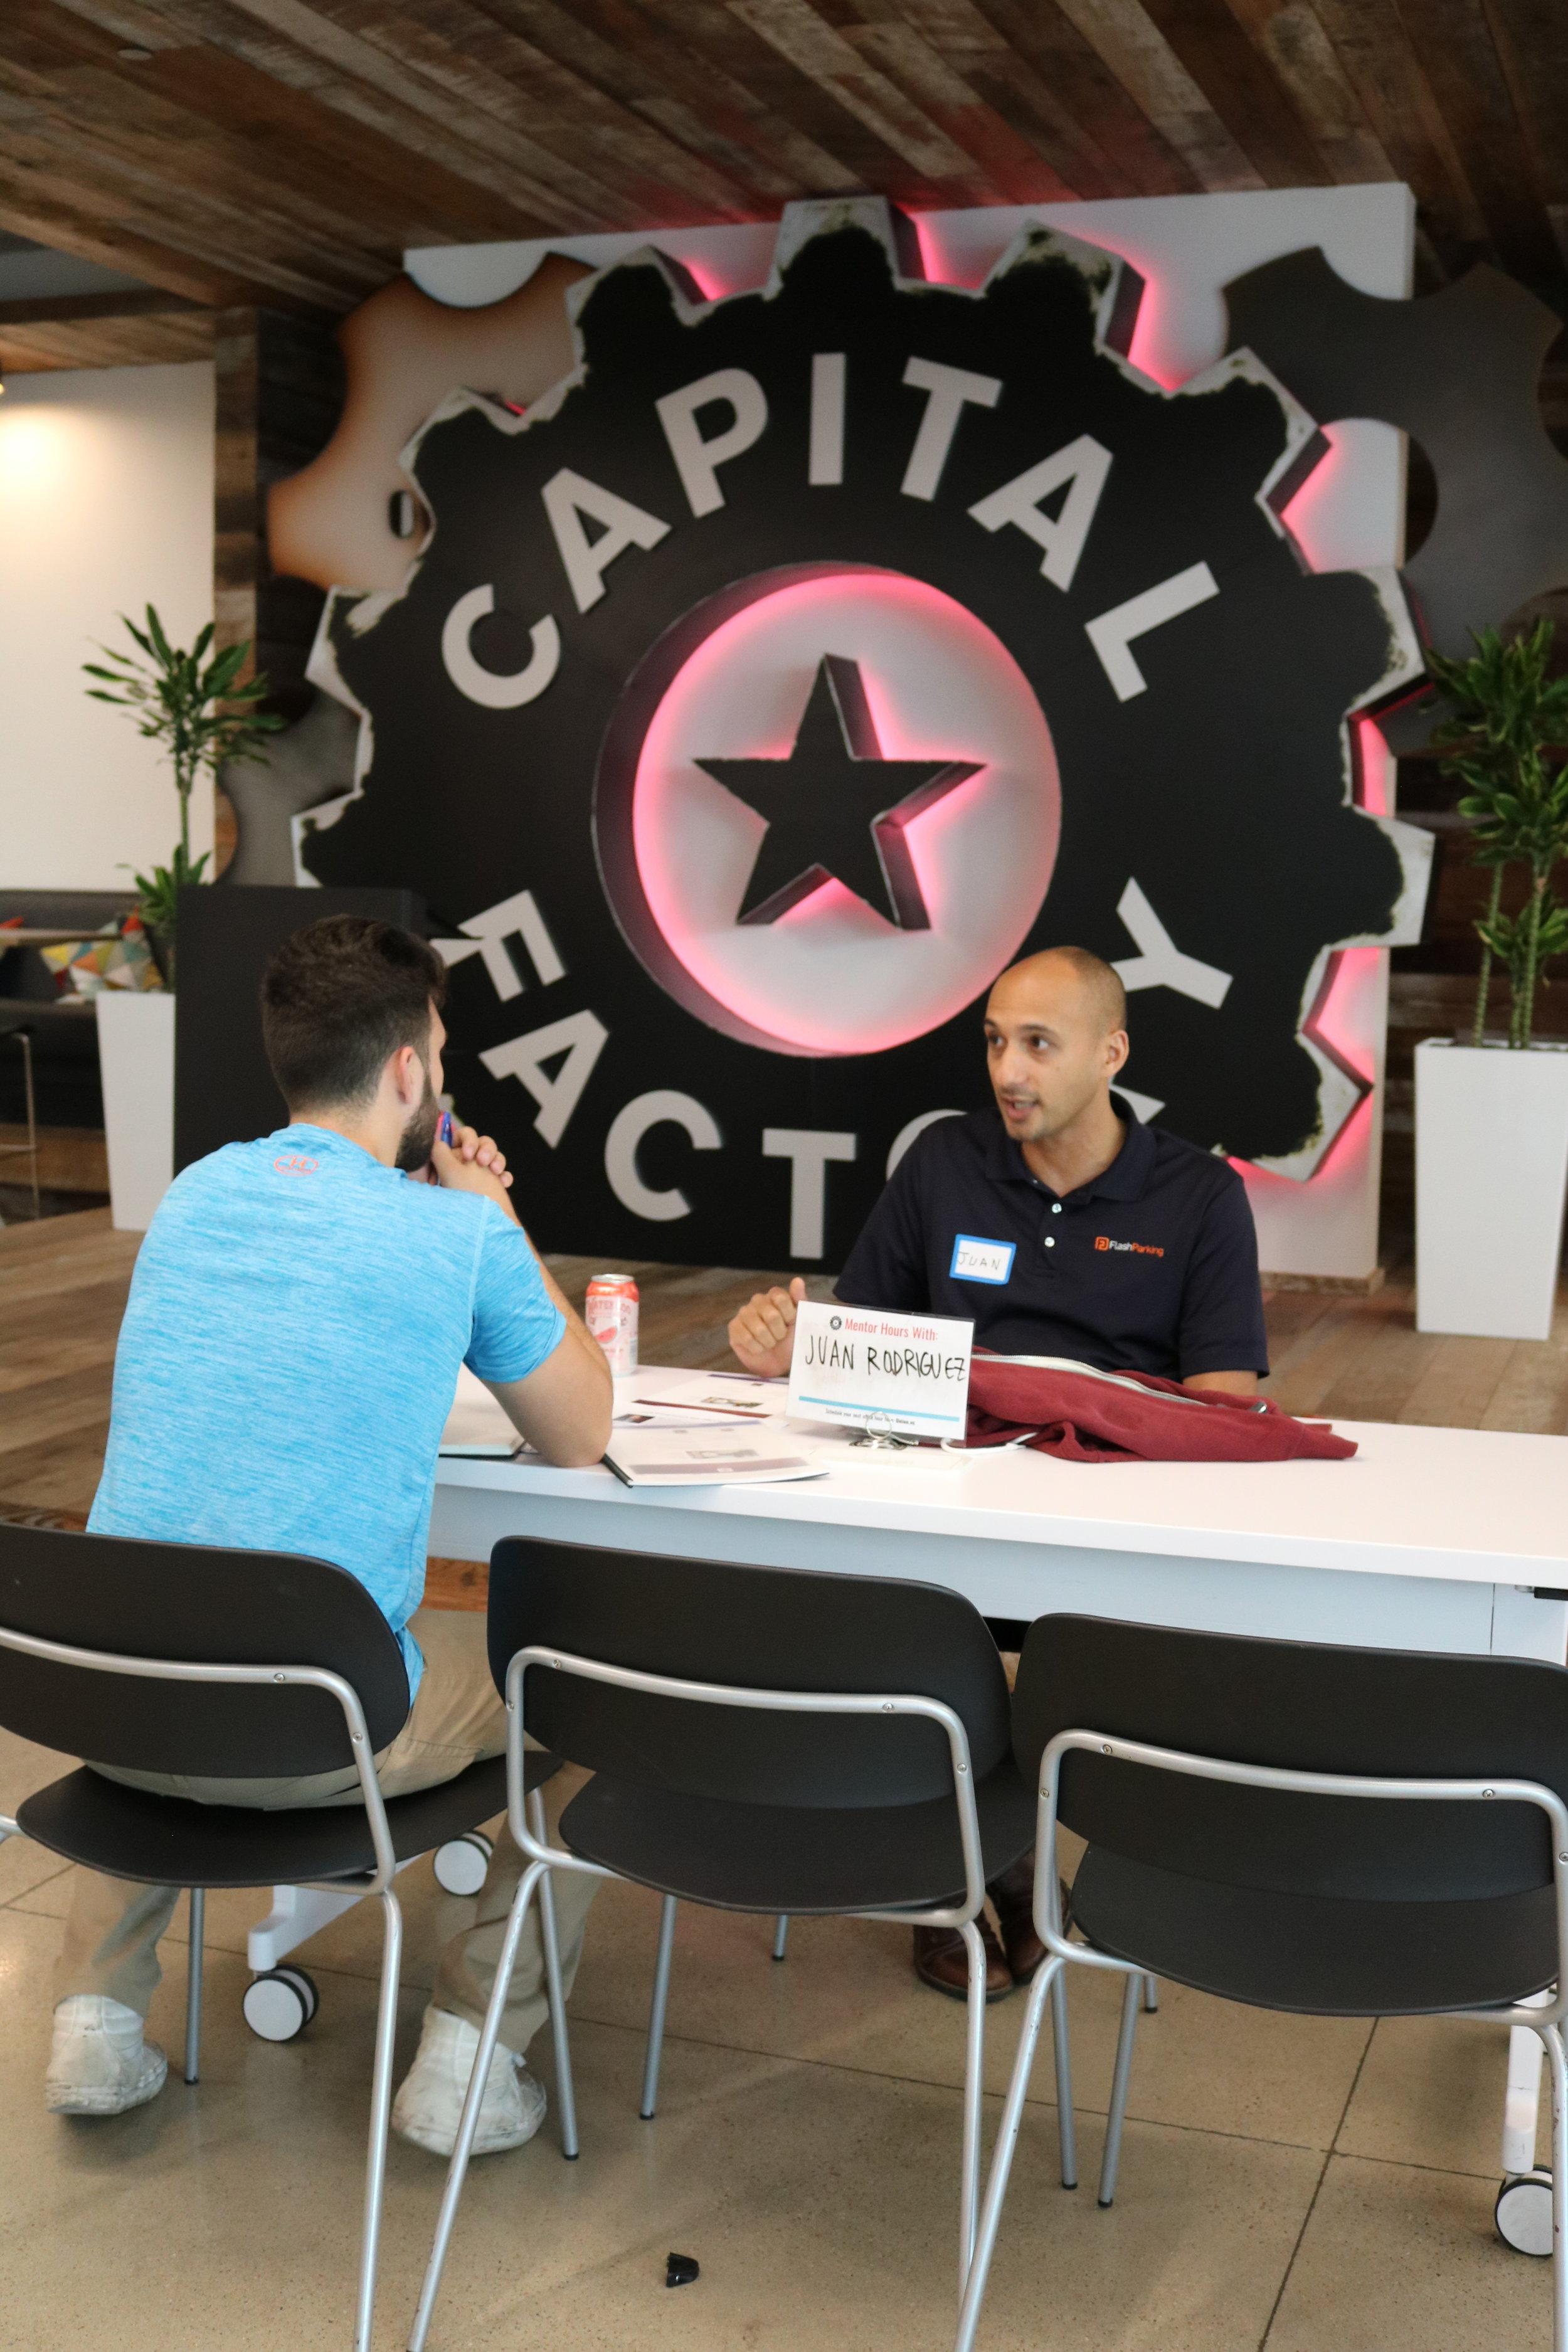 Juan Rodriguez mentors a teen entrepreneur during EPIC office Hours